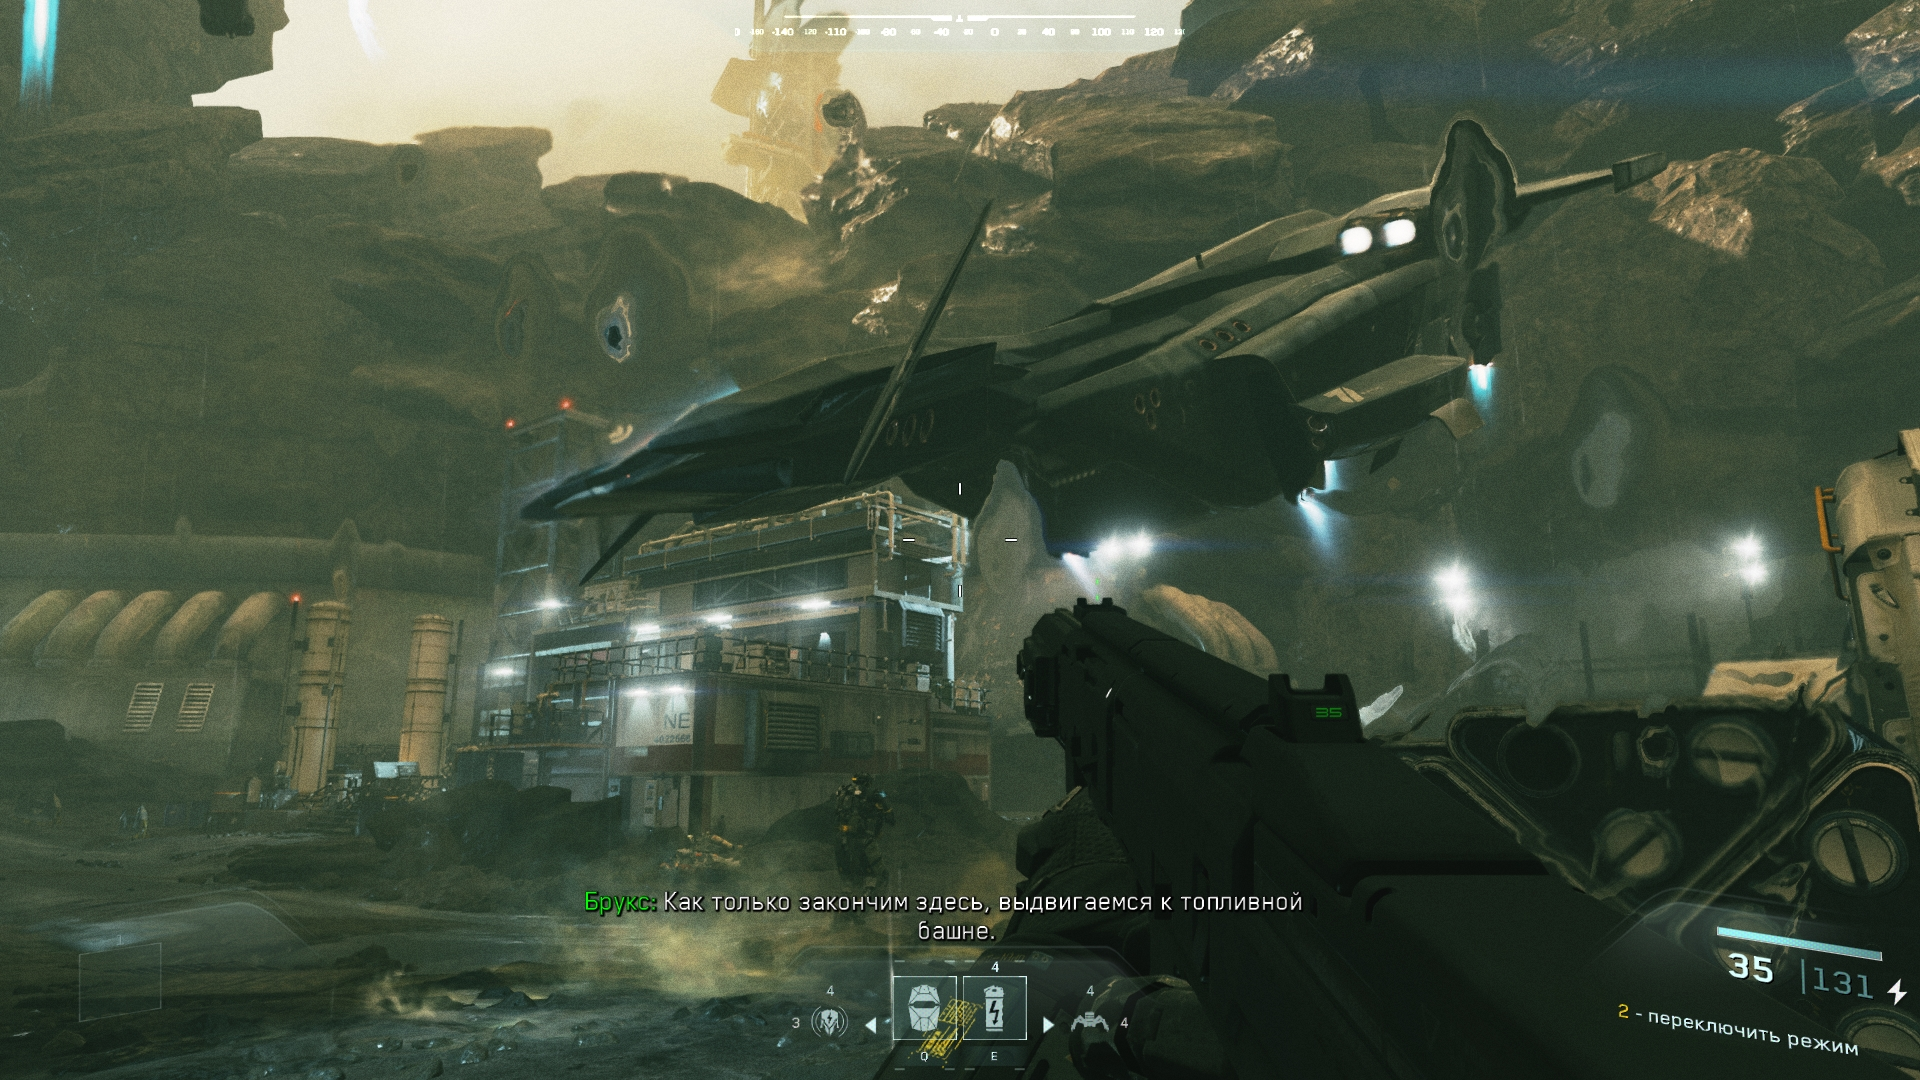 00082.Jpg - Call of Duty: Infinite Warfare